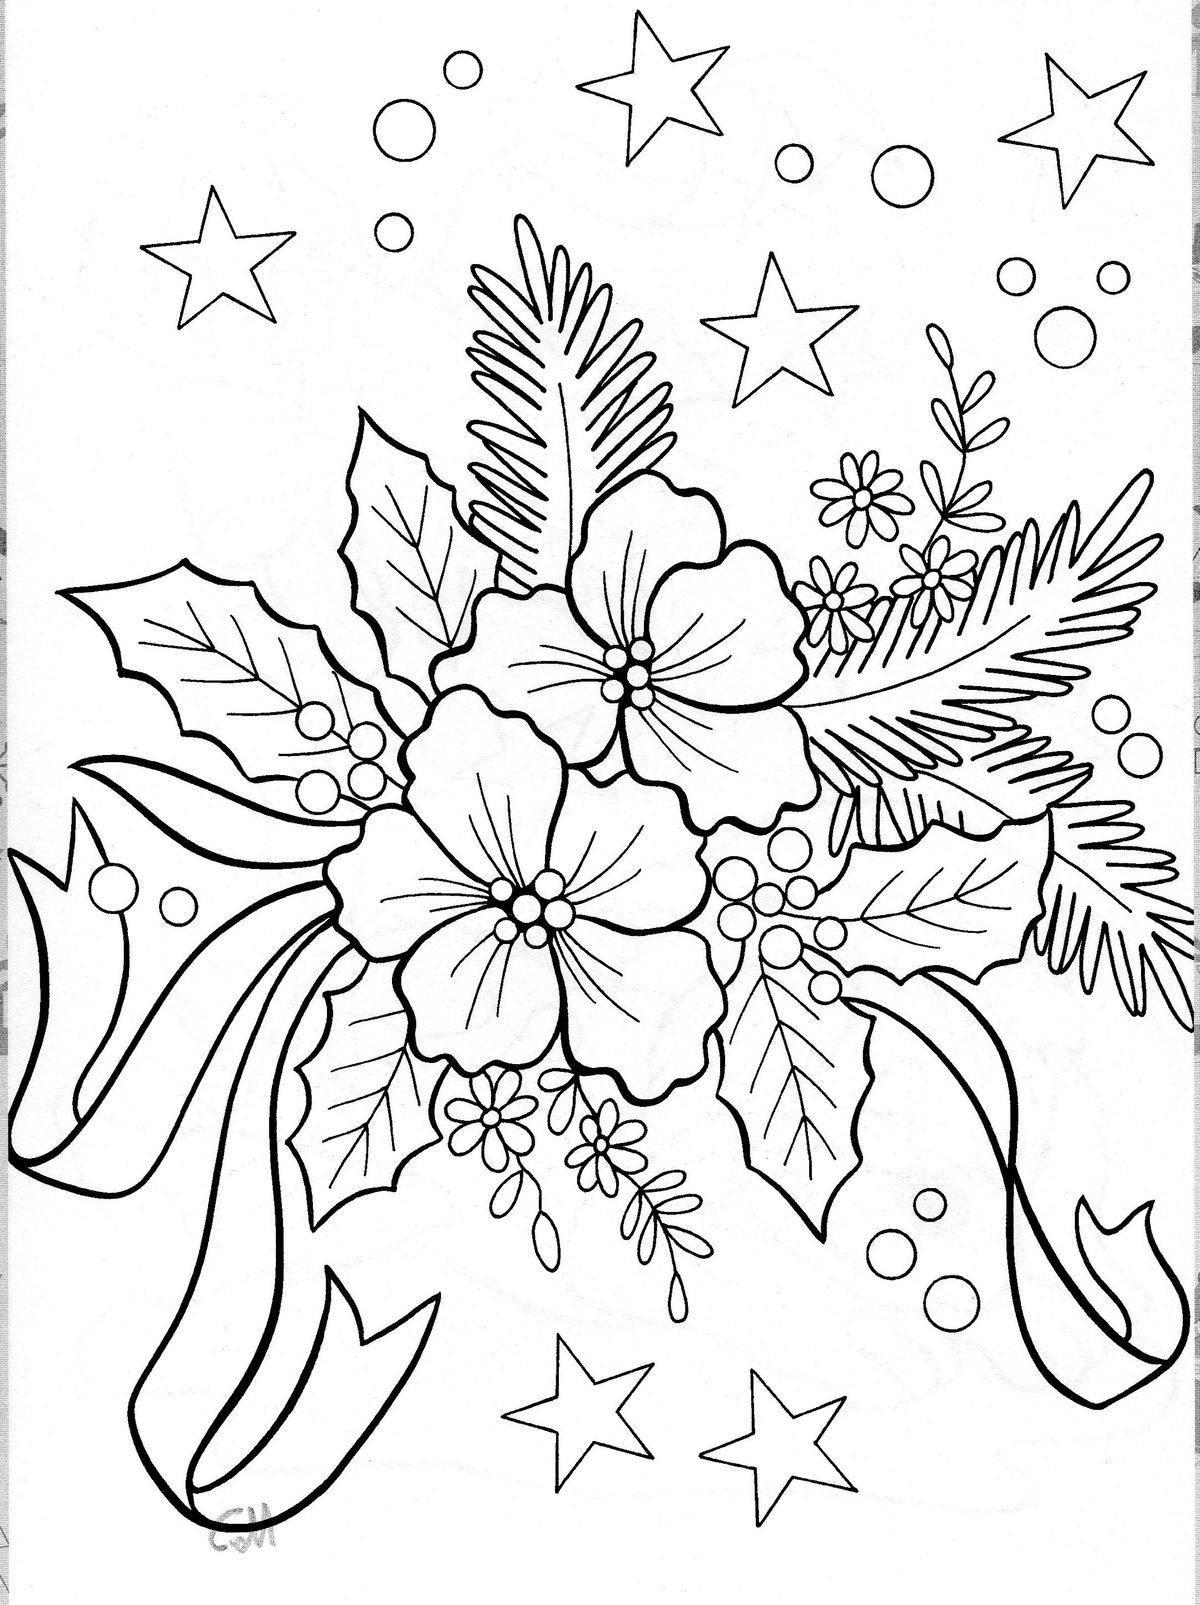 Be8f03b21e92a0aec34069878c04d3c4 Jpg 1 200 1 605 Pixlar Christmas Coloring Pages Coloring Pages Christmas Colors